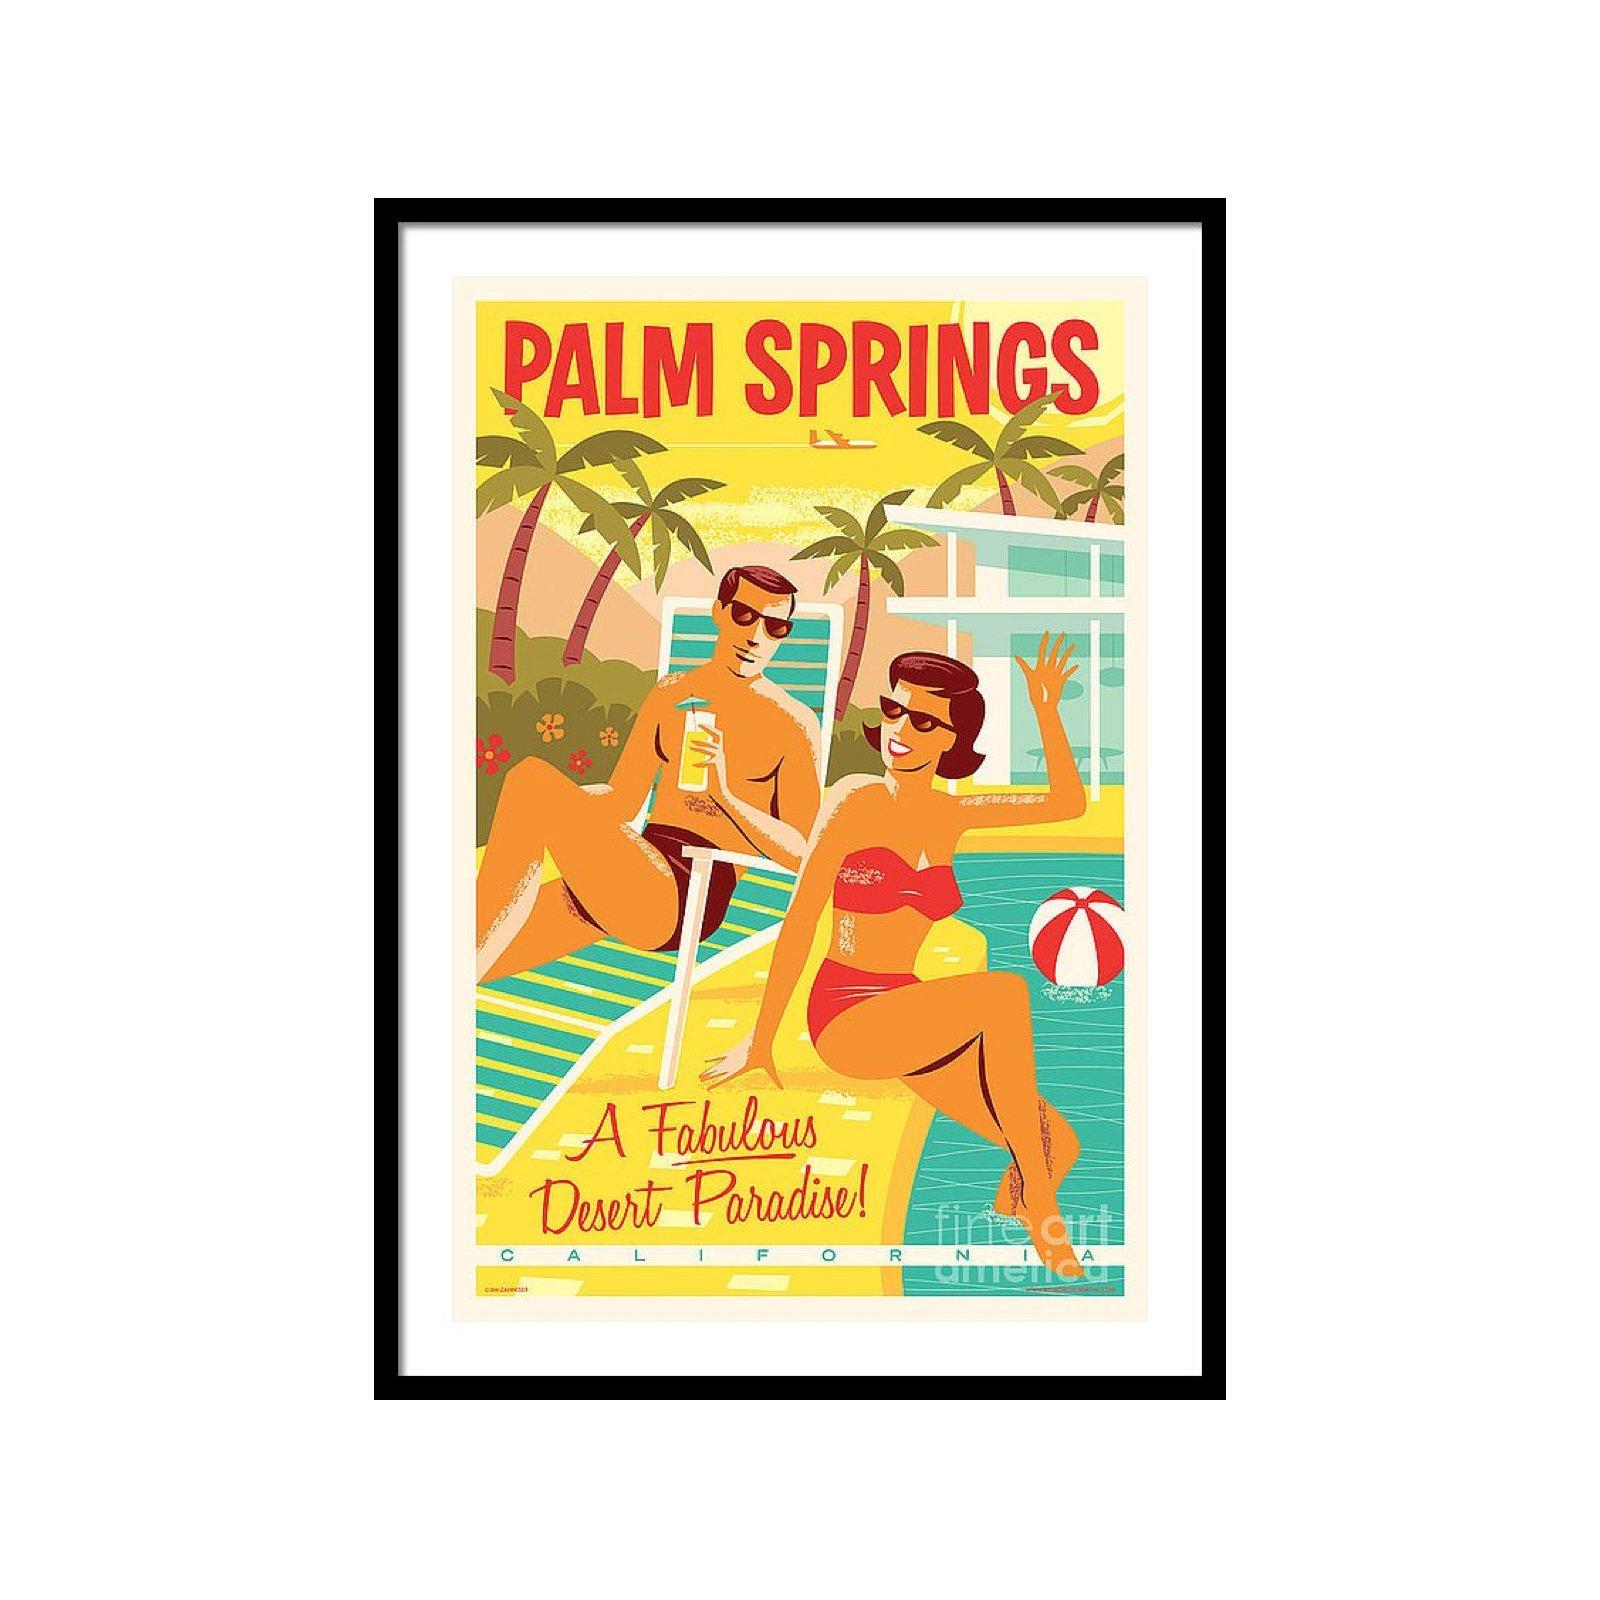 palm springs poster retro travel by jim